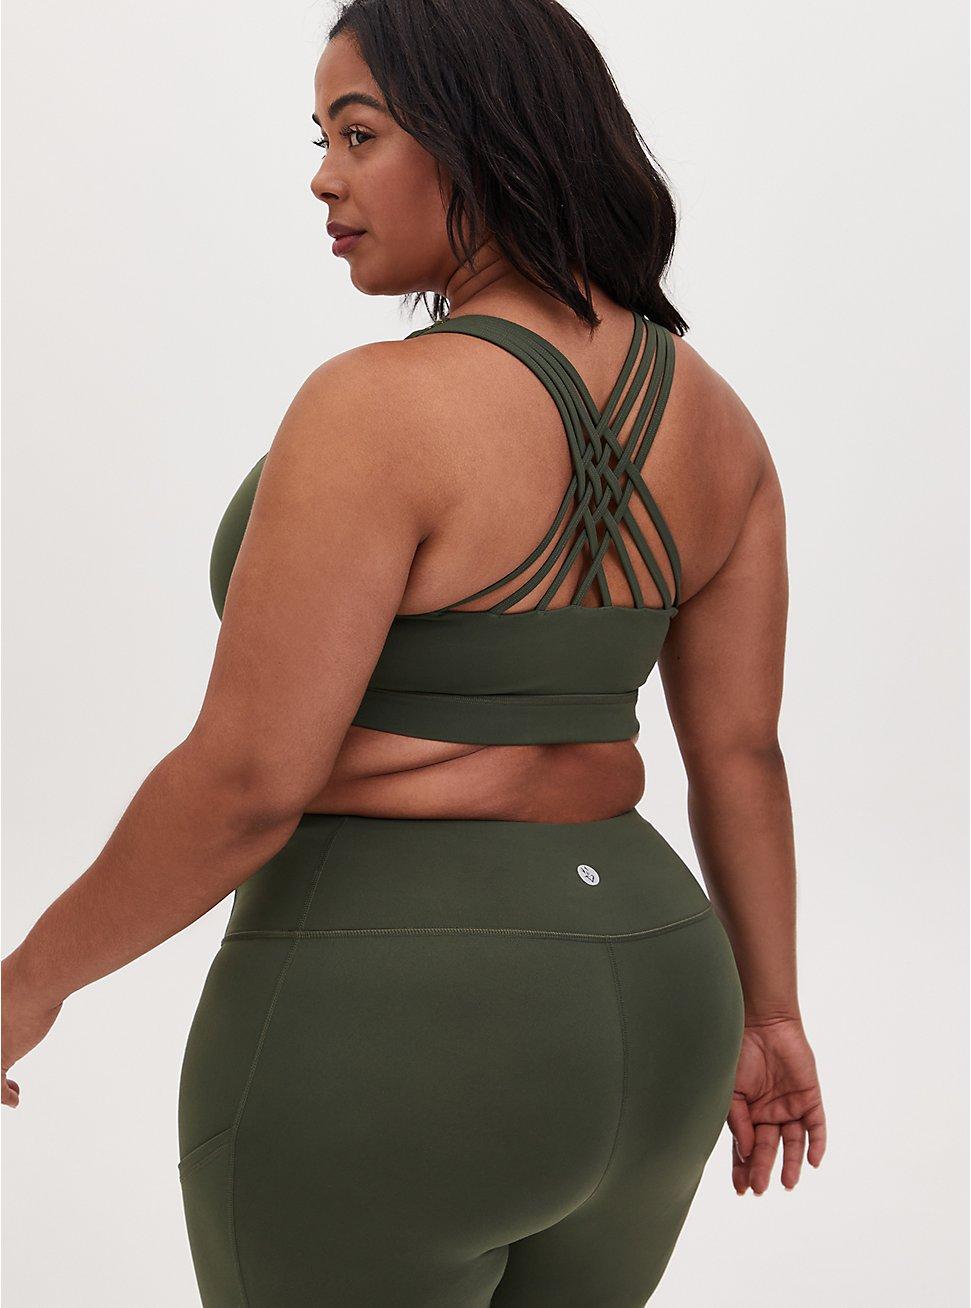 Olive Green & Gold Dots Lattice Wicking Sports Bra, , hi-res